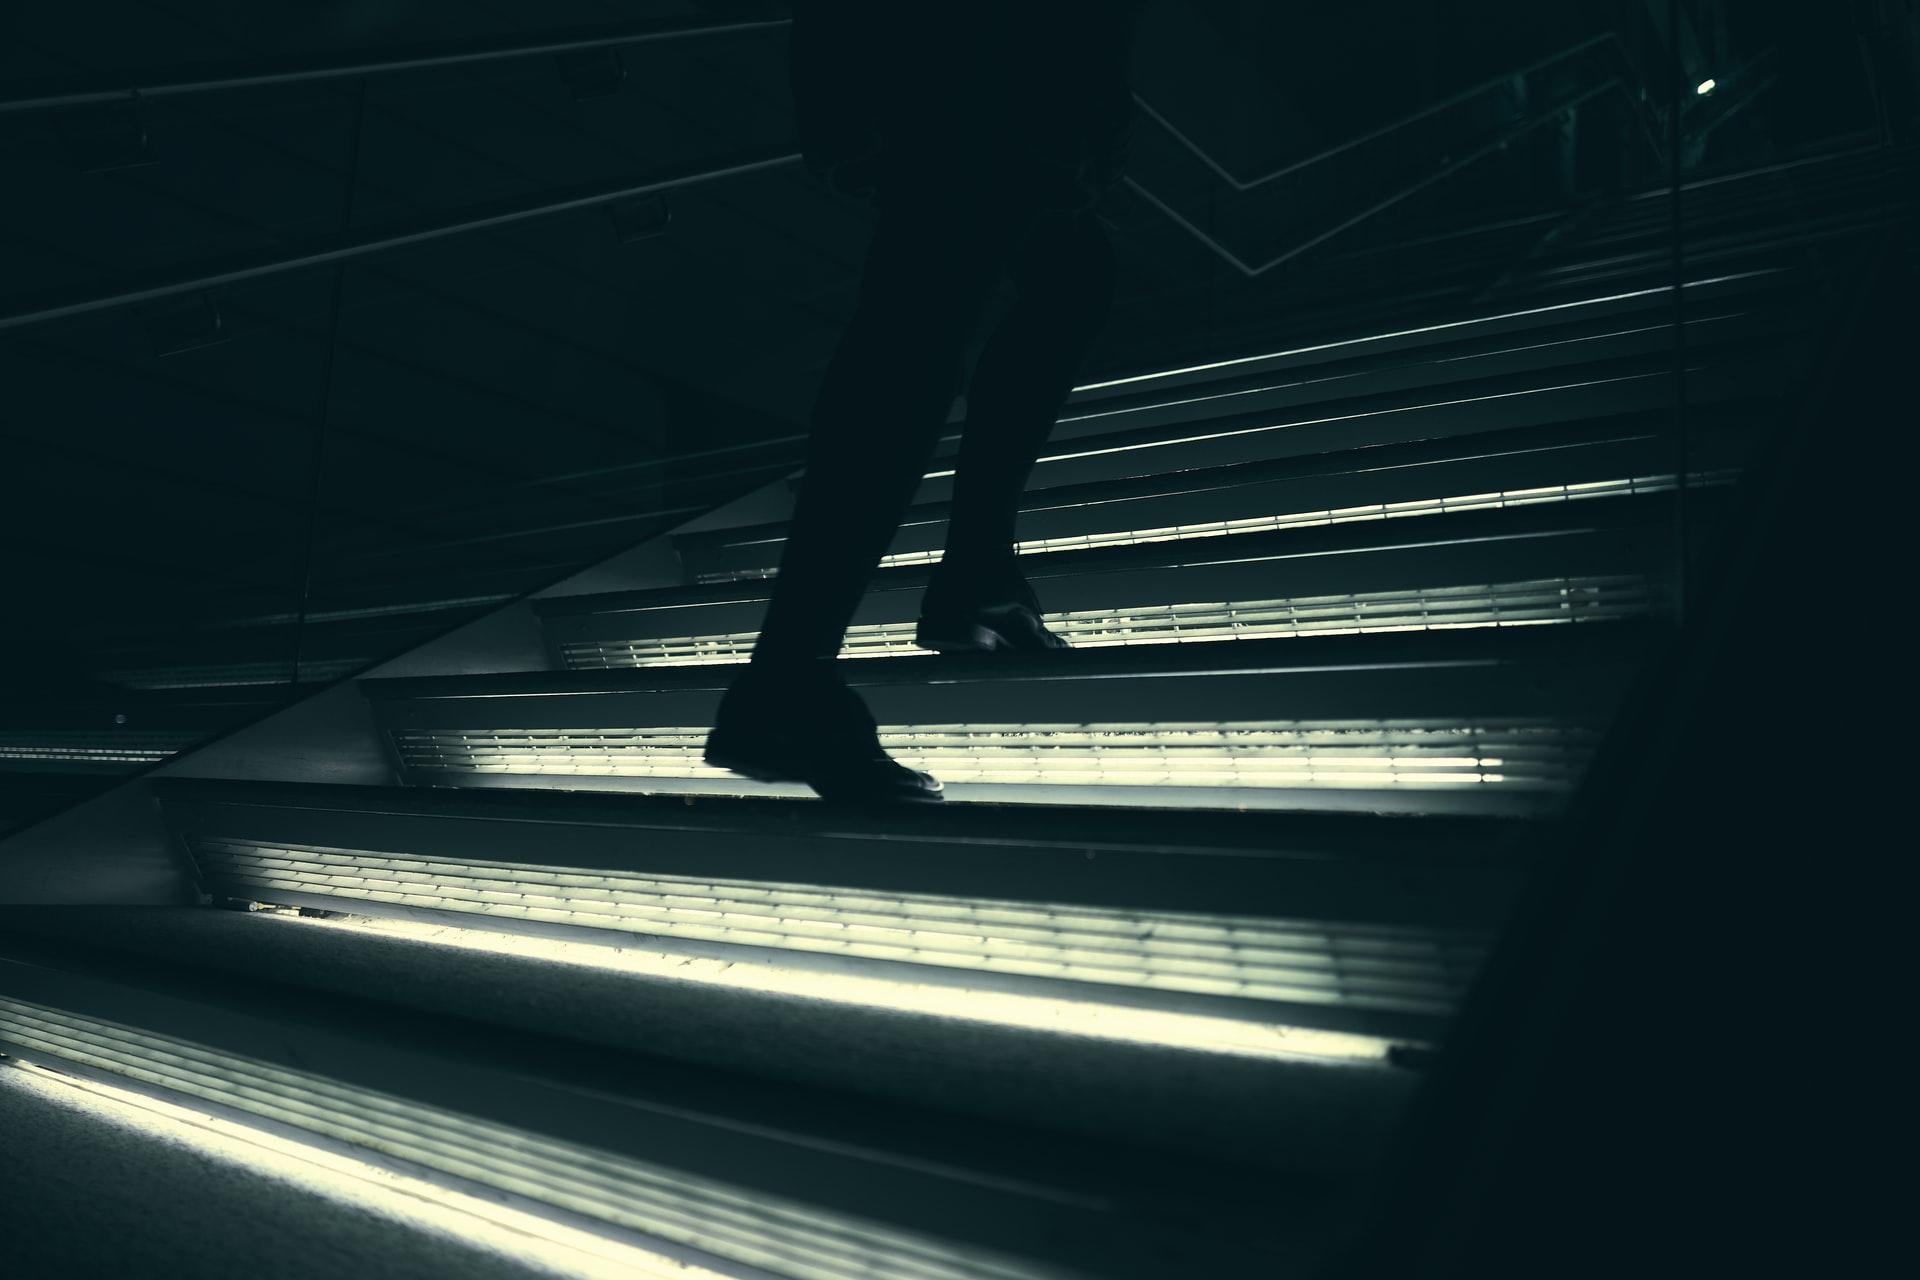 Lighting-up stairways